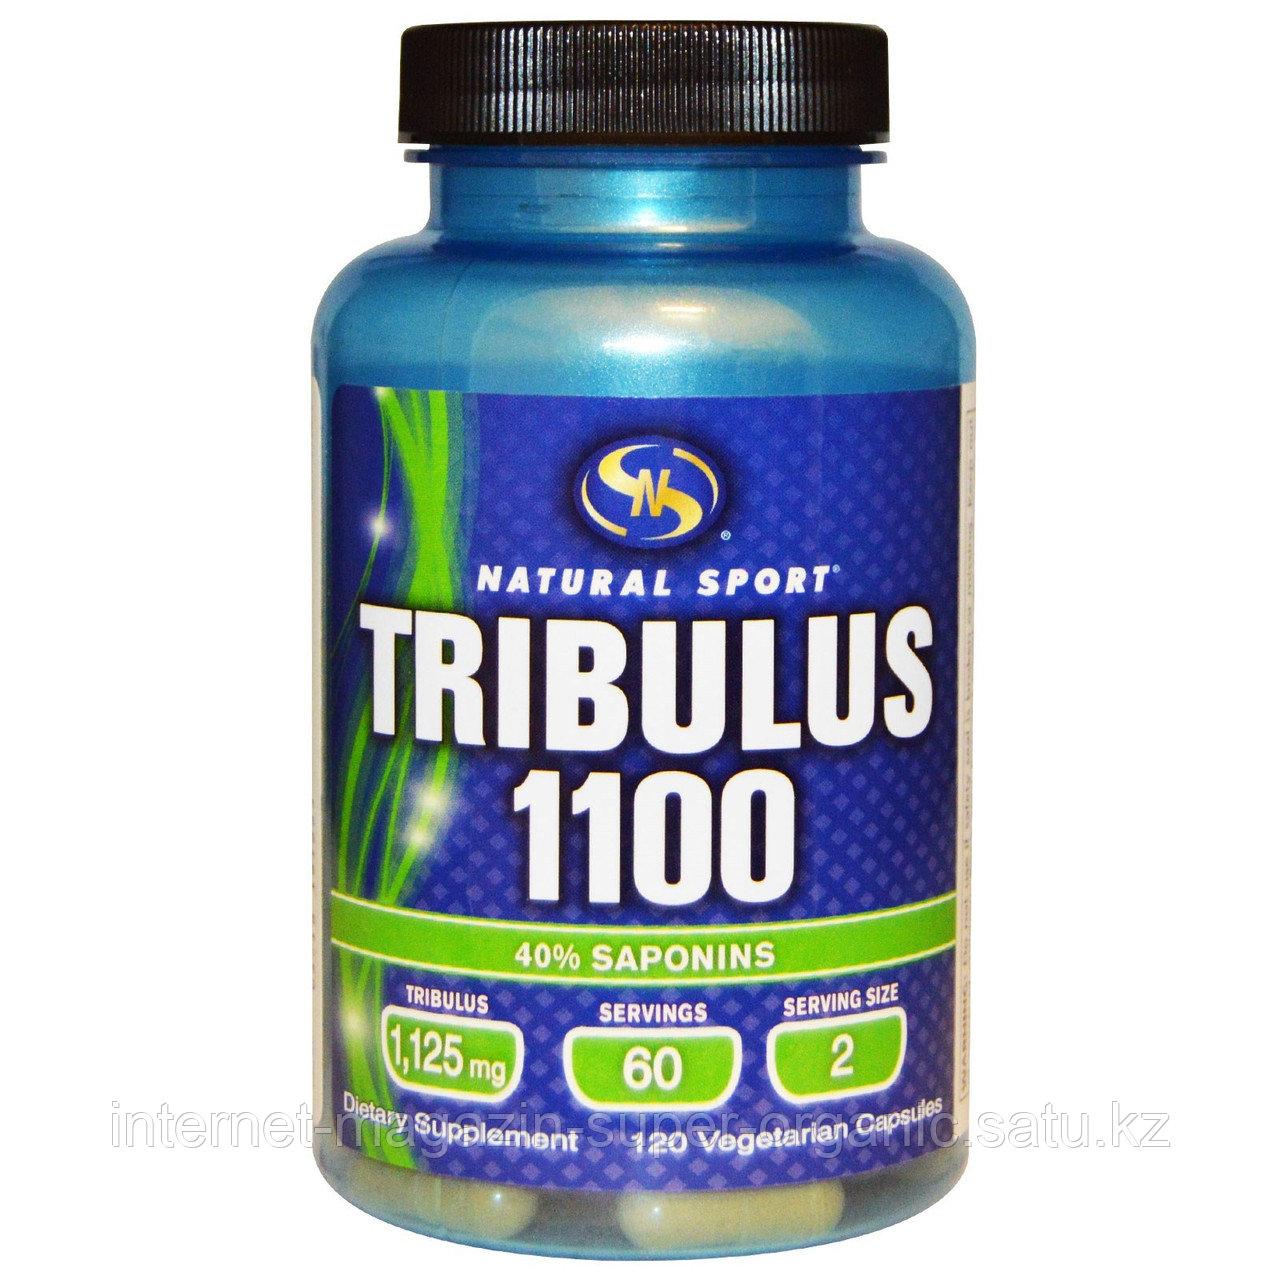 Трибулус 1100 (Tribulus 1100), 120 капсул, Natural Sport